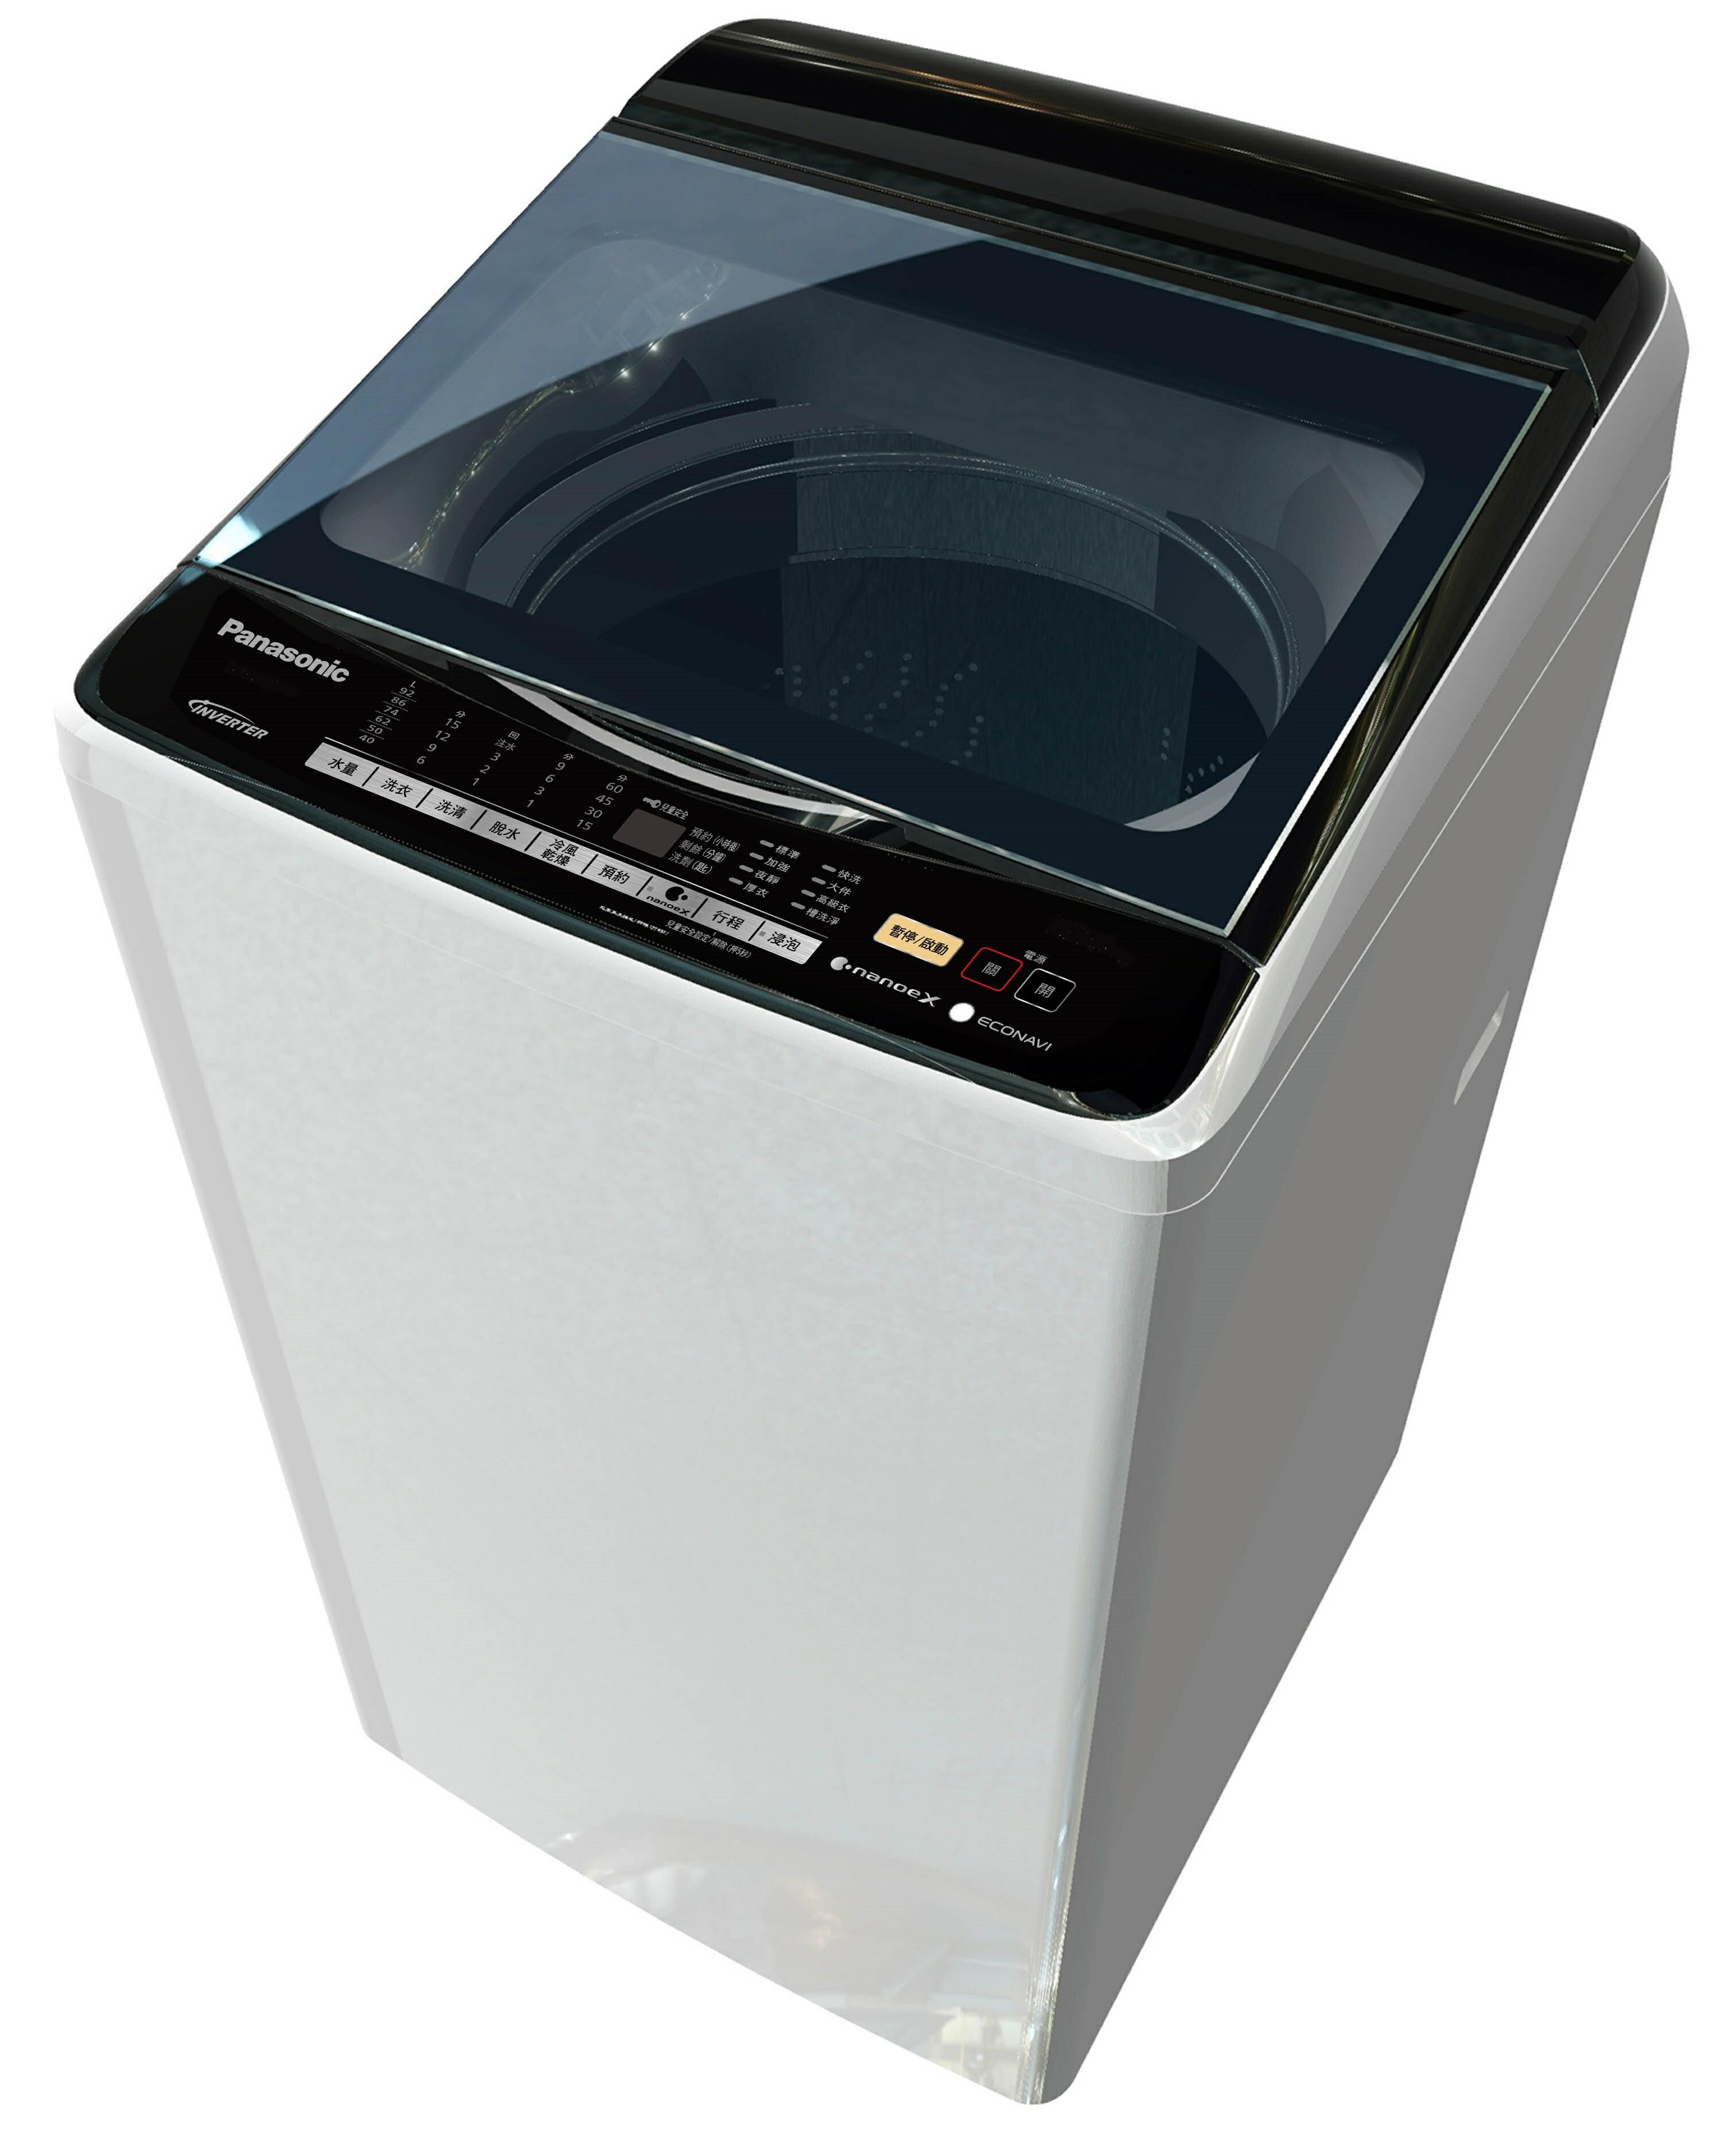 <br/><br/>  好禮送★【Panasonic 國際牌】12公斤單槽定頻洗衣機NA-120EB-W【三井3C】<br/><br/>